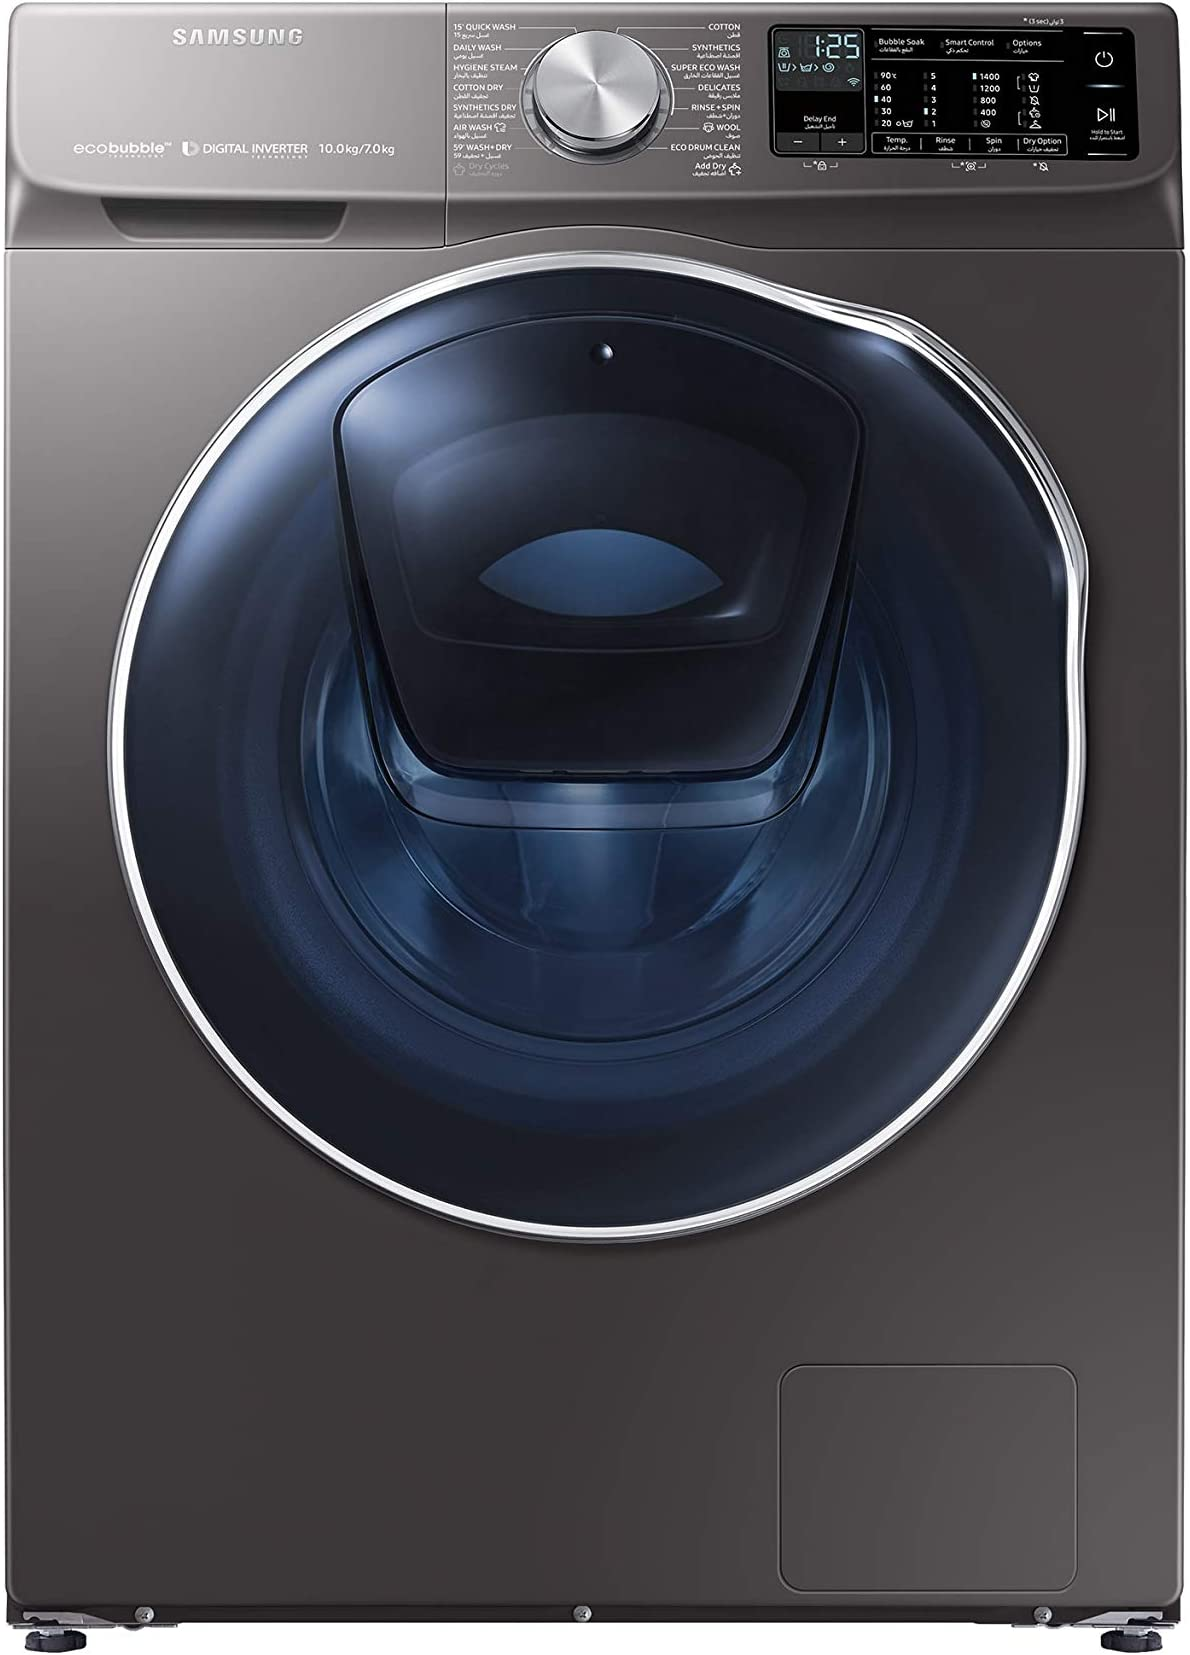 Samsung 10kg Wash 7kg Dryer 1400 Rpm Washer Dryer Inox Wd10n64fr2x Gu 1 Year Warranty Price In Uae Amazon Uae Kanbkam